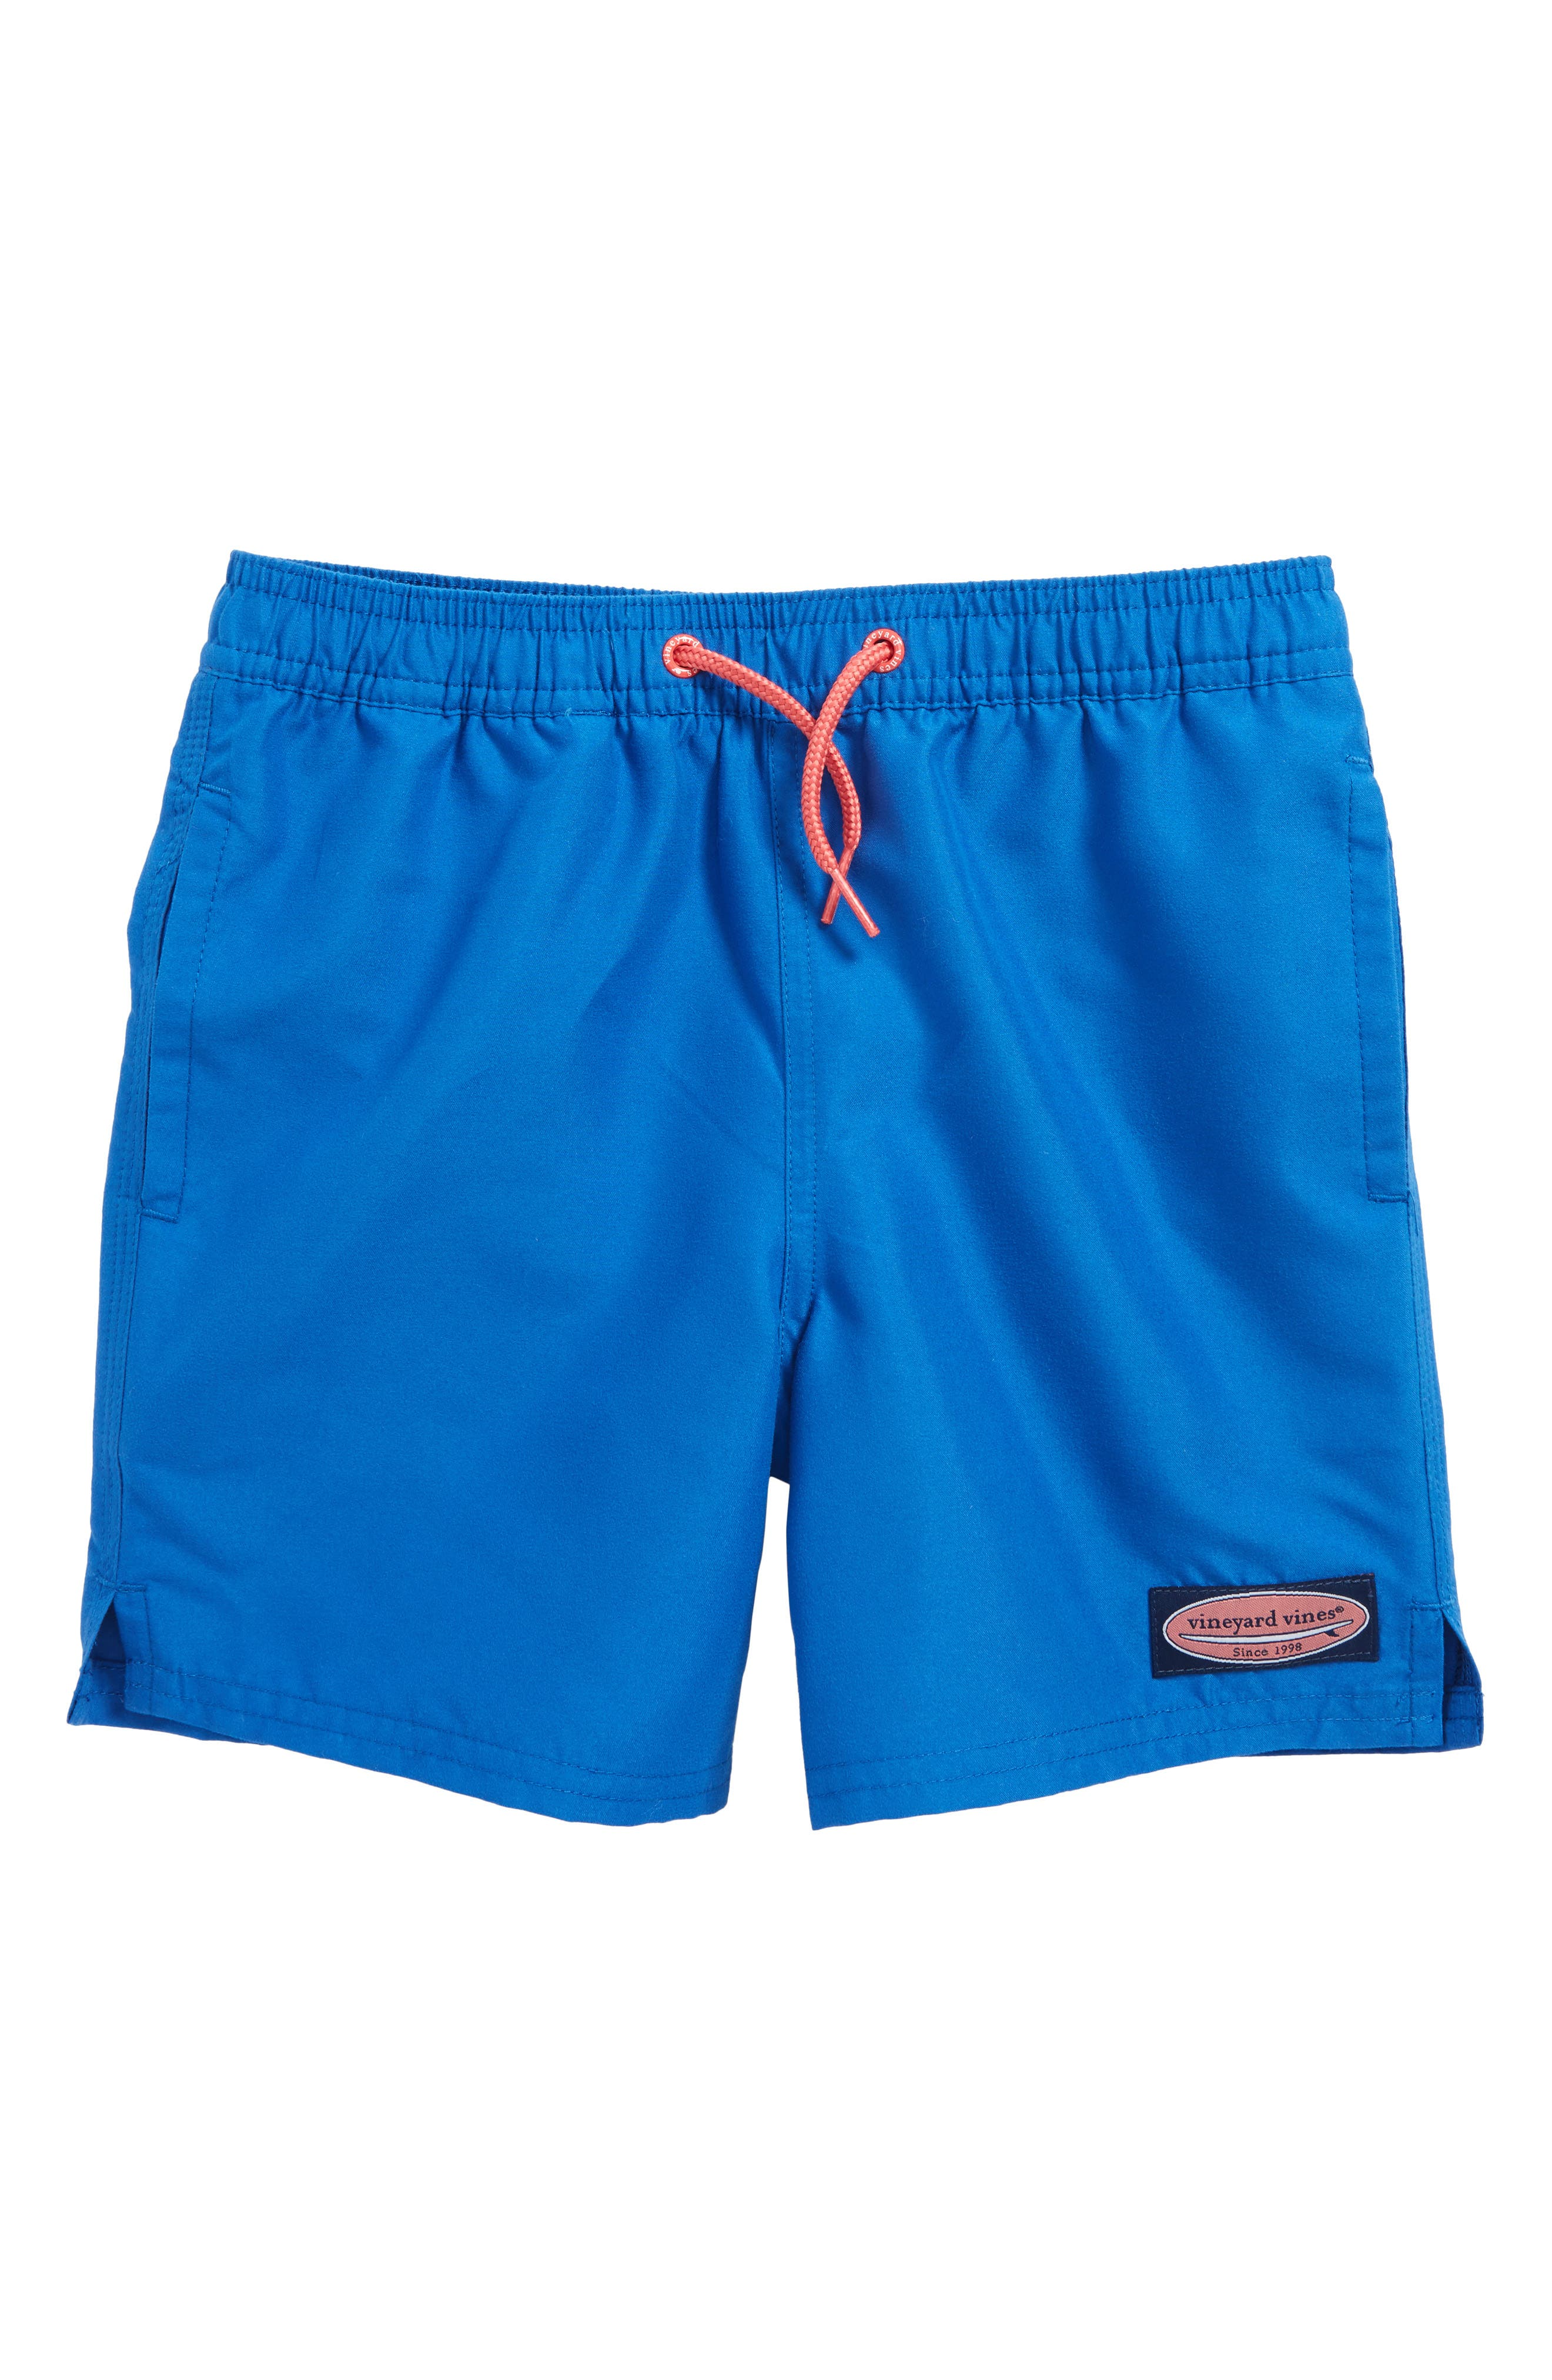 Bungalow Board Shorts,                             Main thumbnail 1, color,                             Yacht Blue